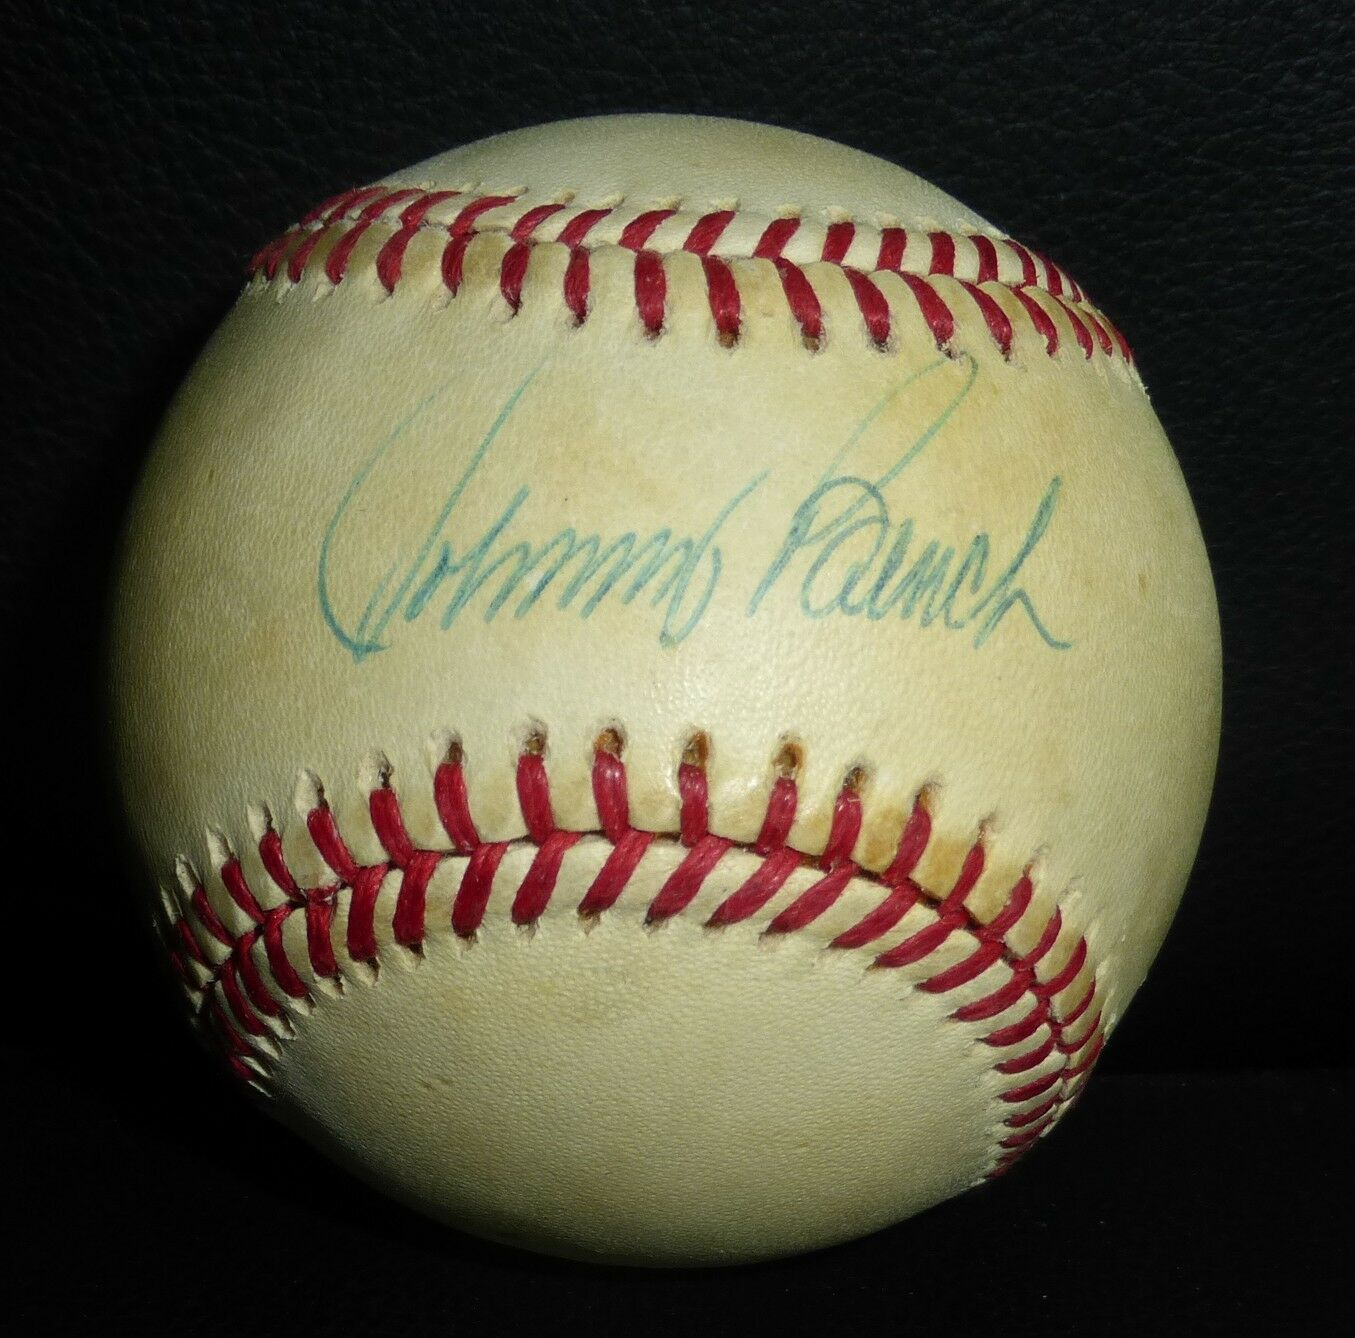 Johnny bench signed c Feeney national league baseball psa dna coa rouges autograph